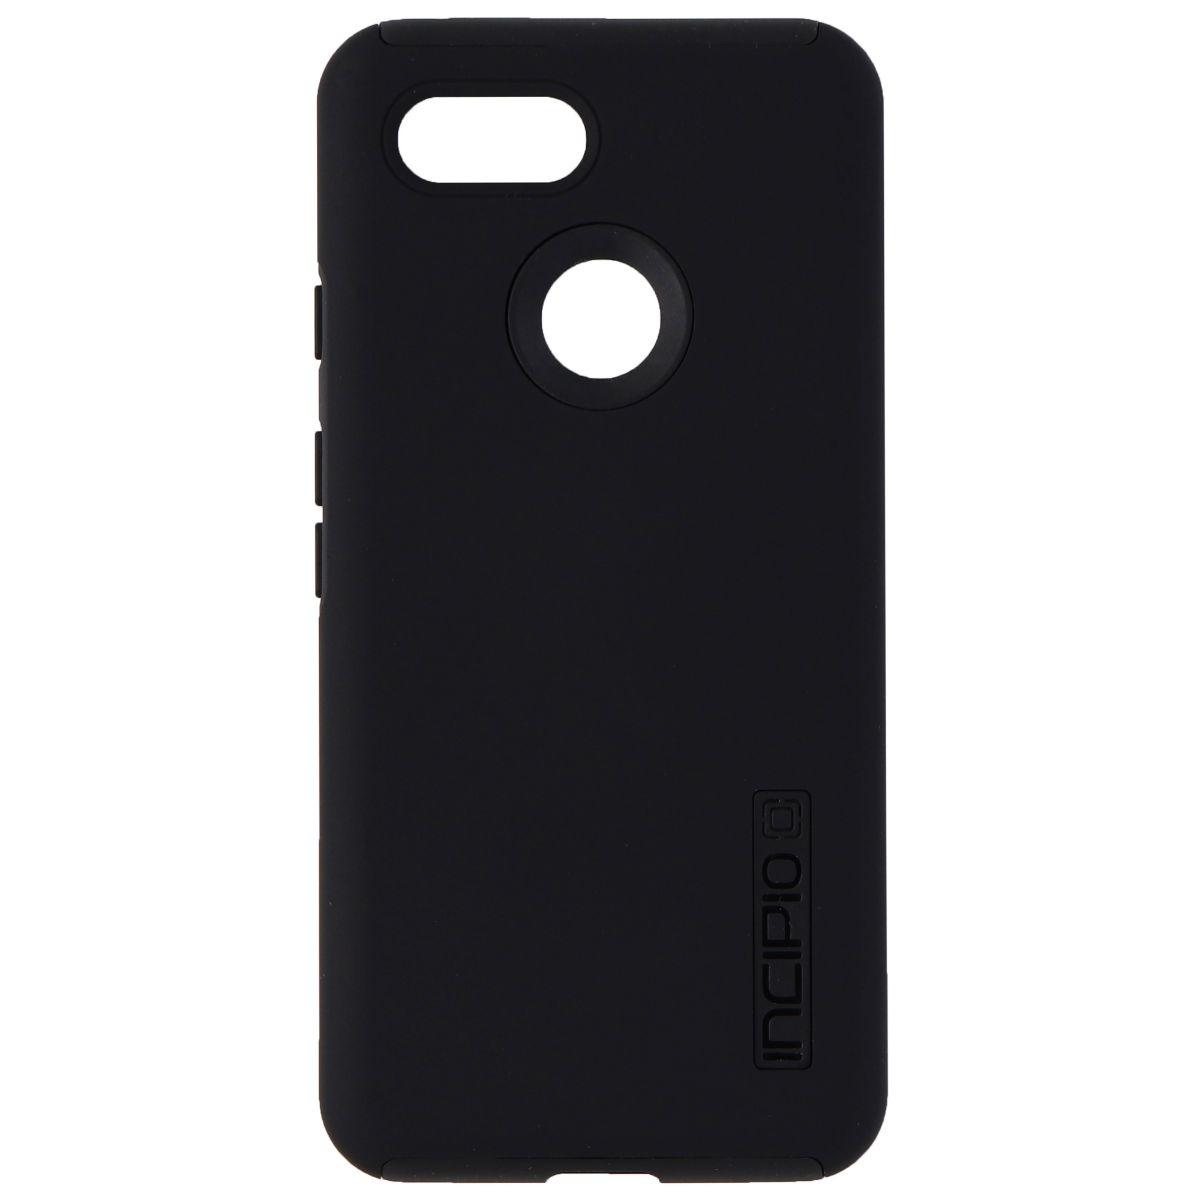 Incipio GG-066-BLK Dual Pro Protective Case for Google Pixel 3 - Black